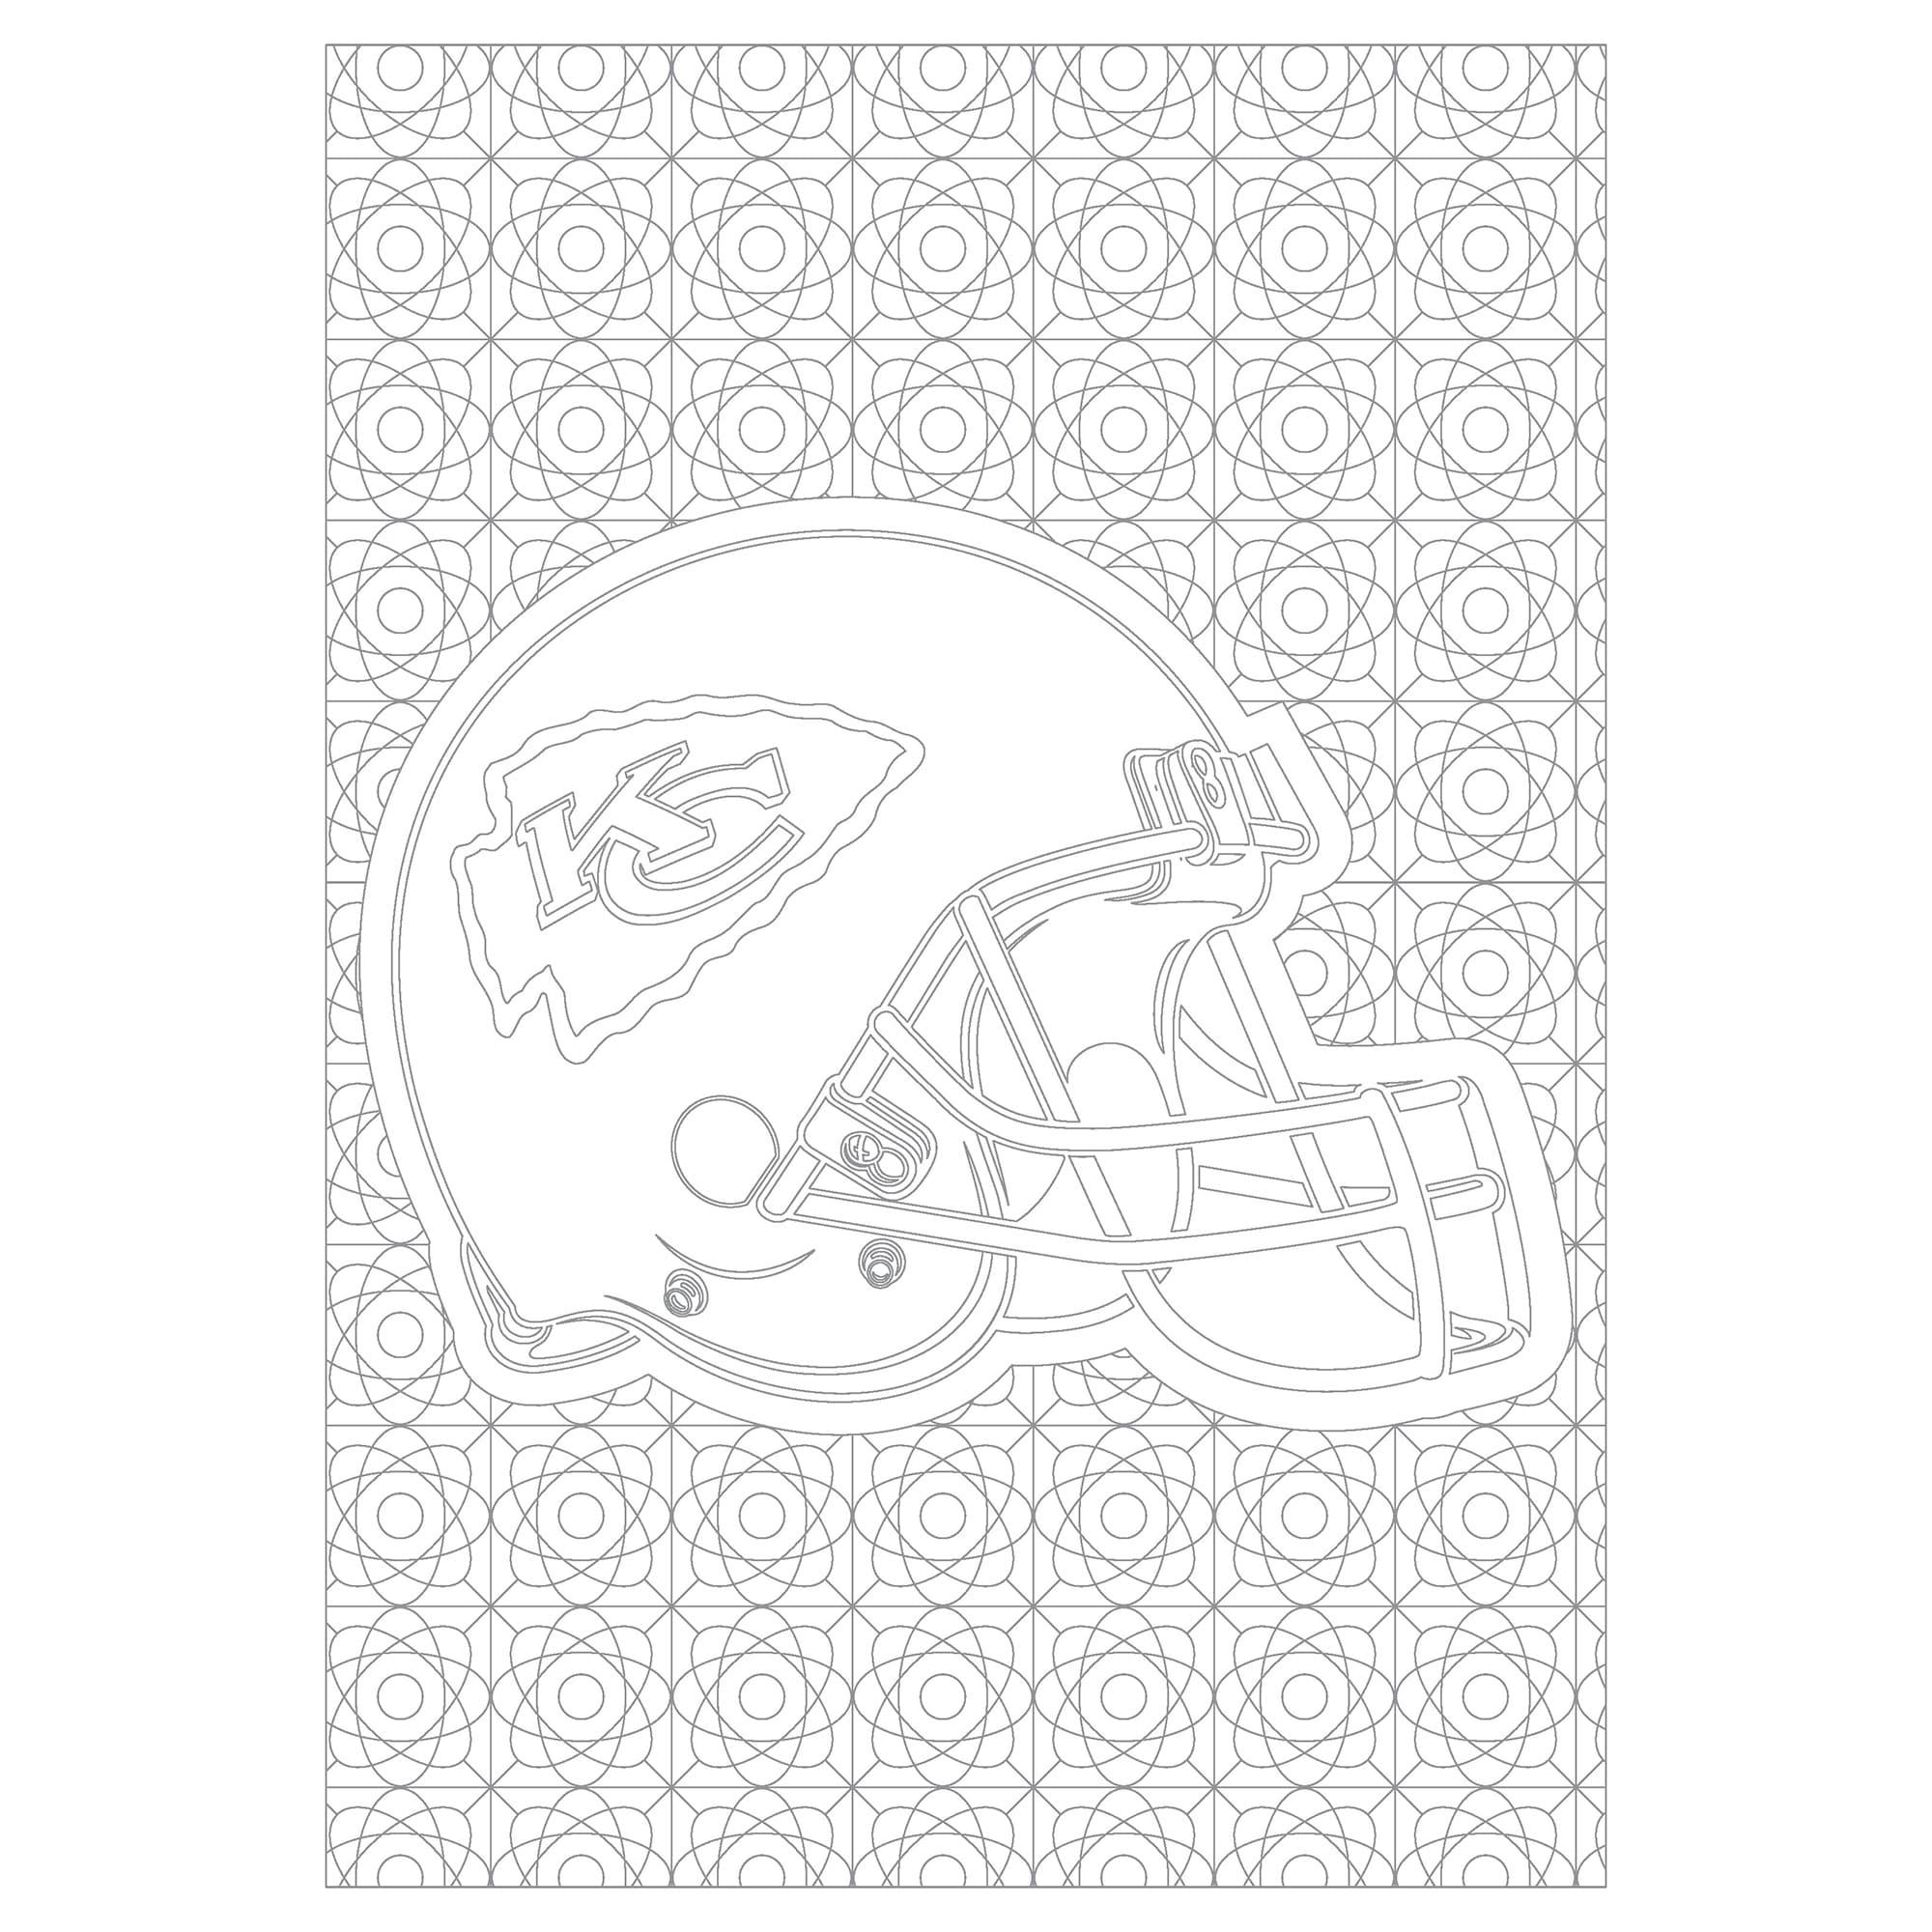 Helmet Kansas City Chiefs Football Helmet Coloring Pages